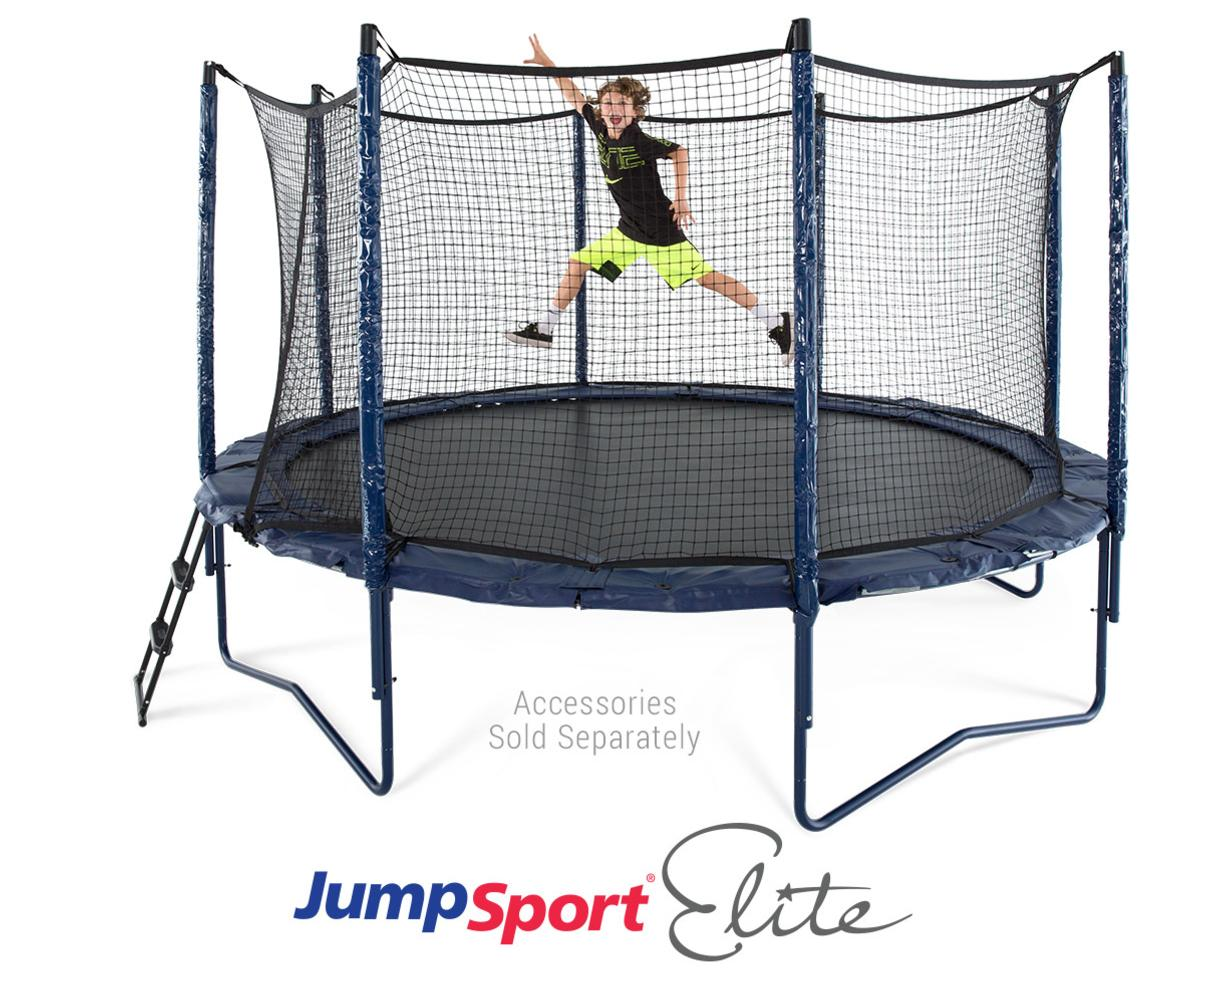 $100 Off Any JumpSport Elite Trampoline System